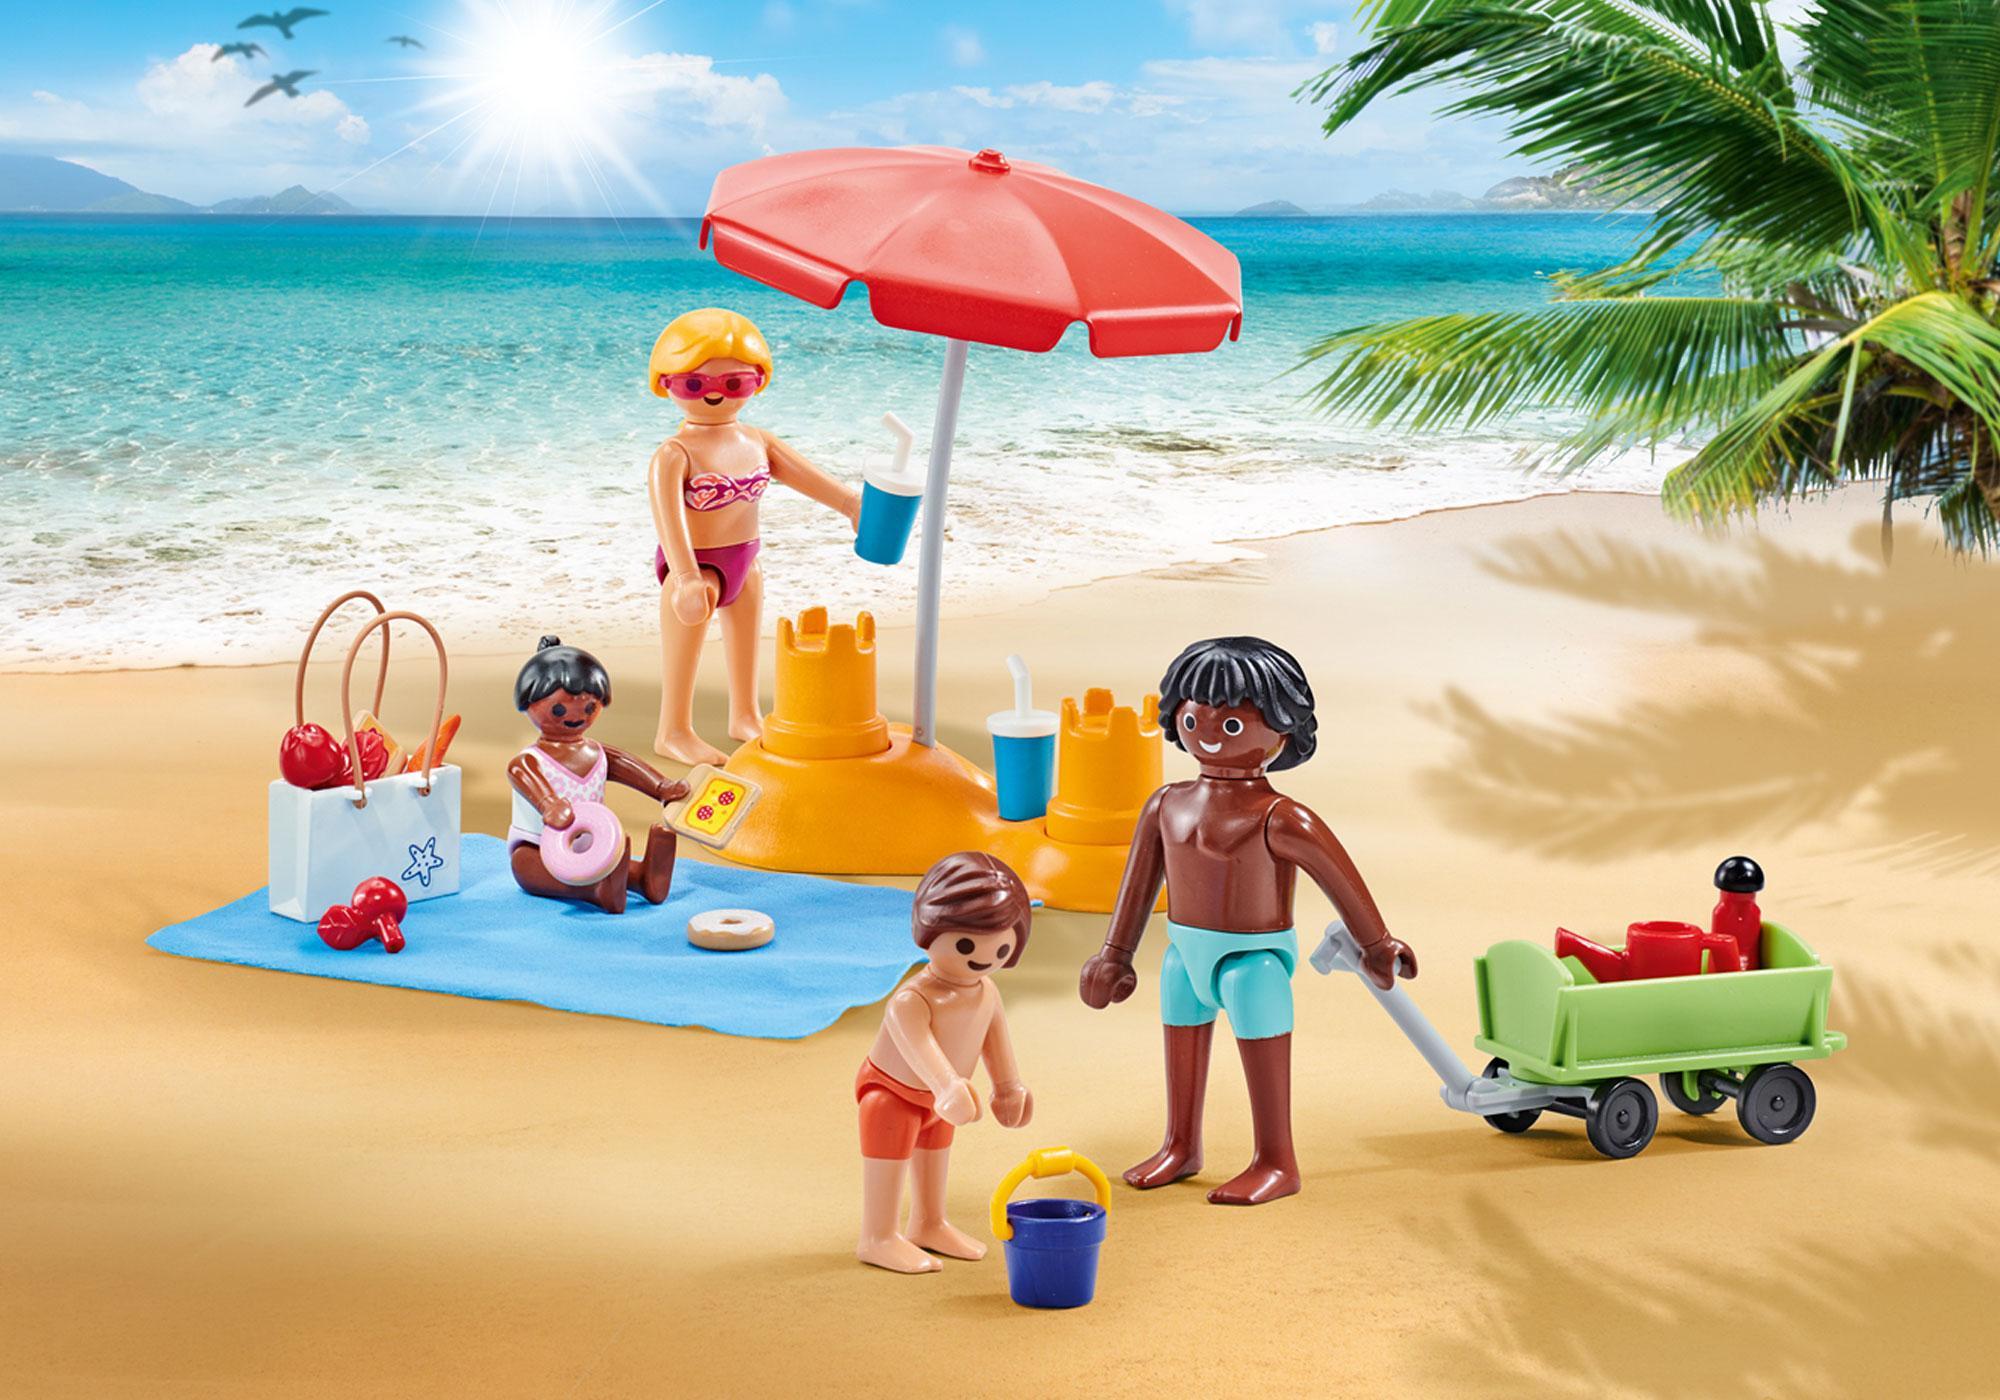 9819_product_detail/Οικογένεια στην παραλία